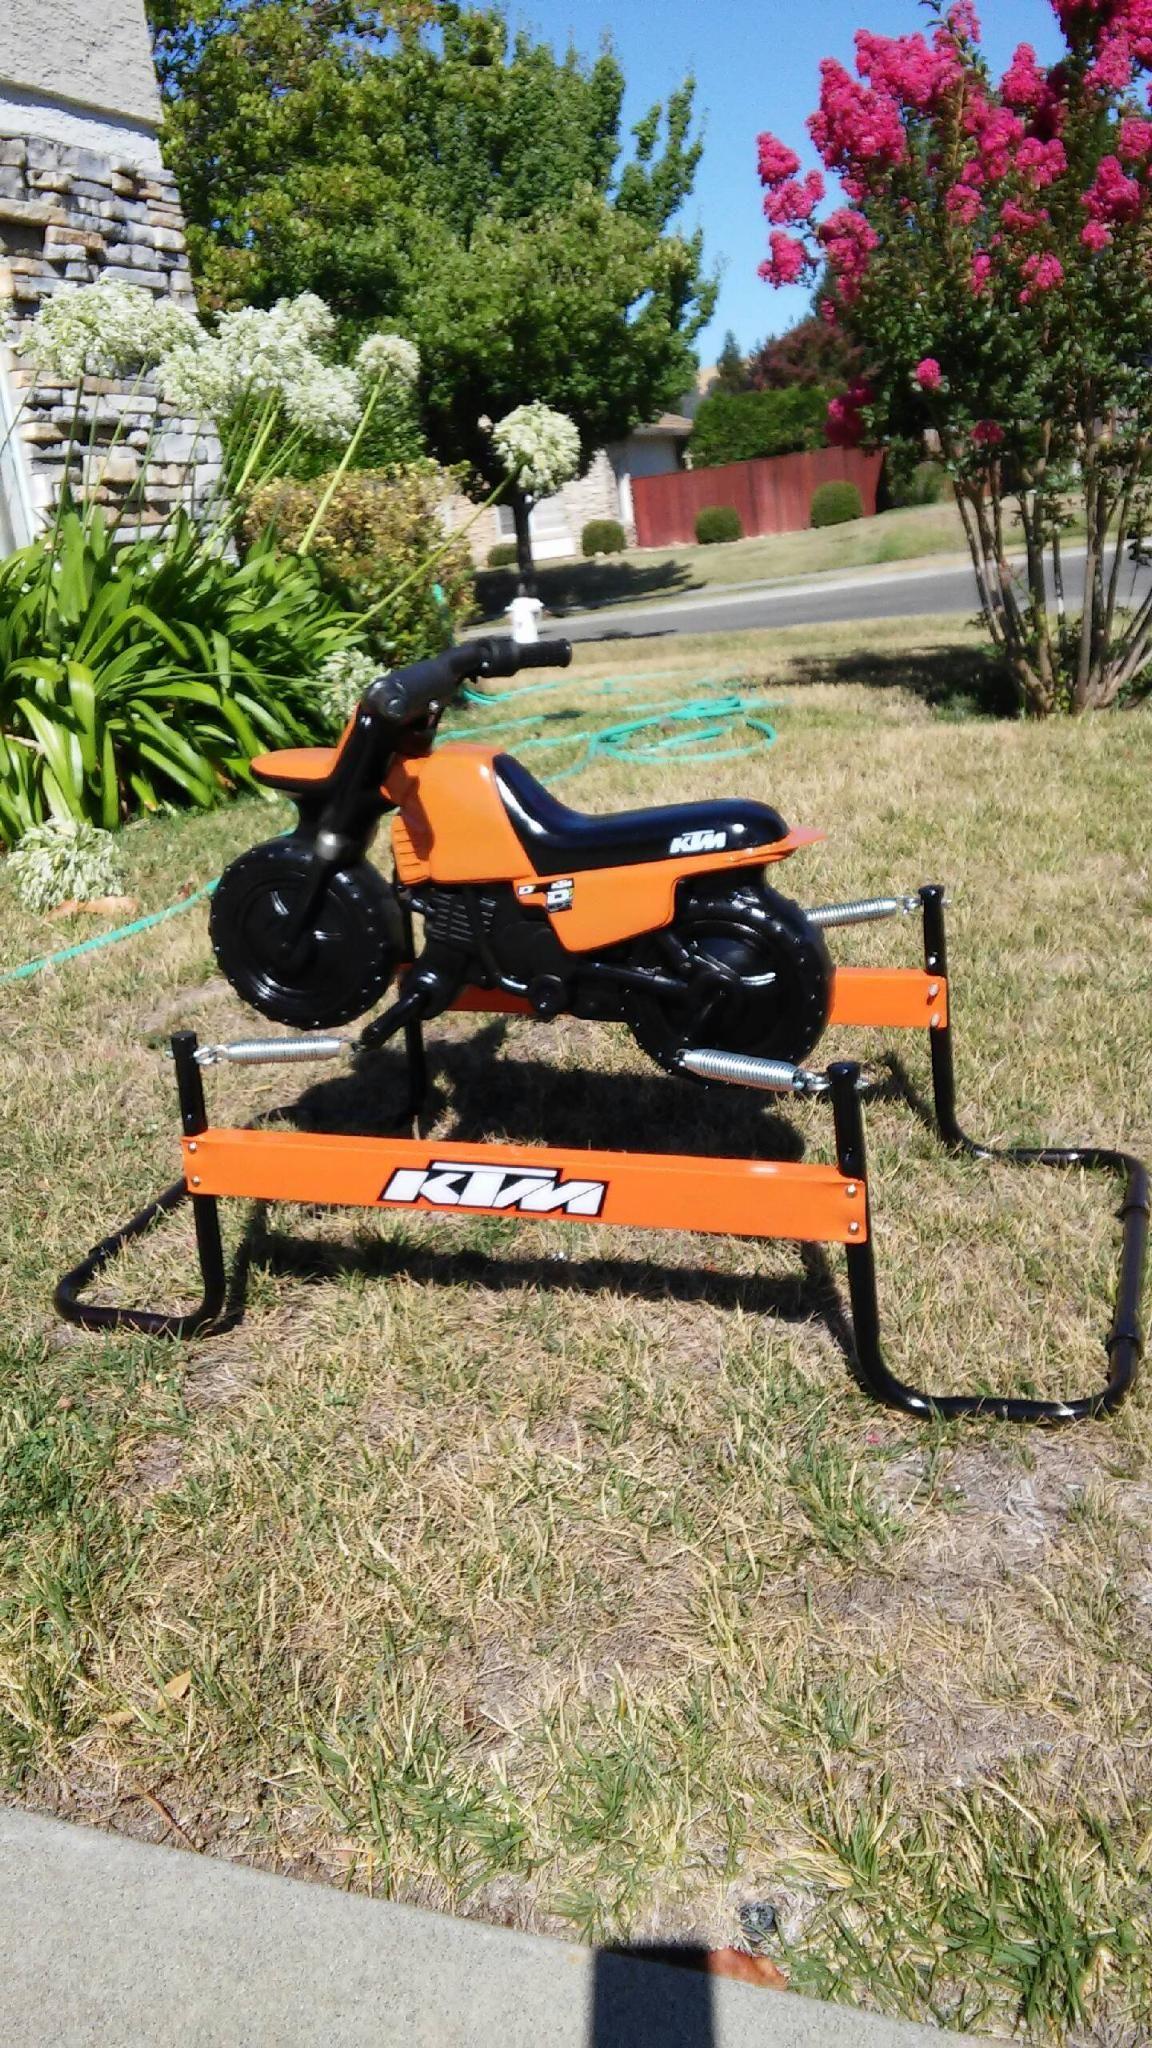 605e3f7225db2 KTM Rocker for Kids | other | Motocross baby, Racing baby, Toddler toys